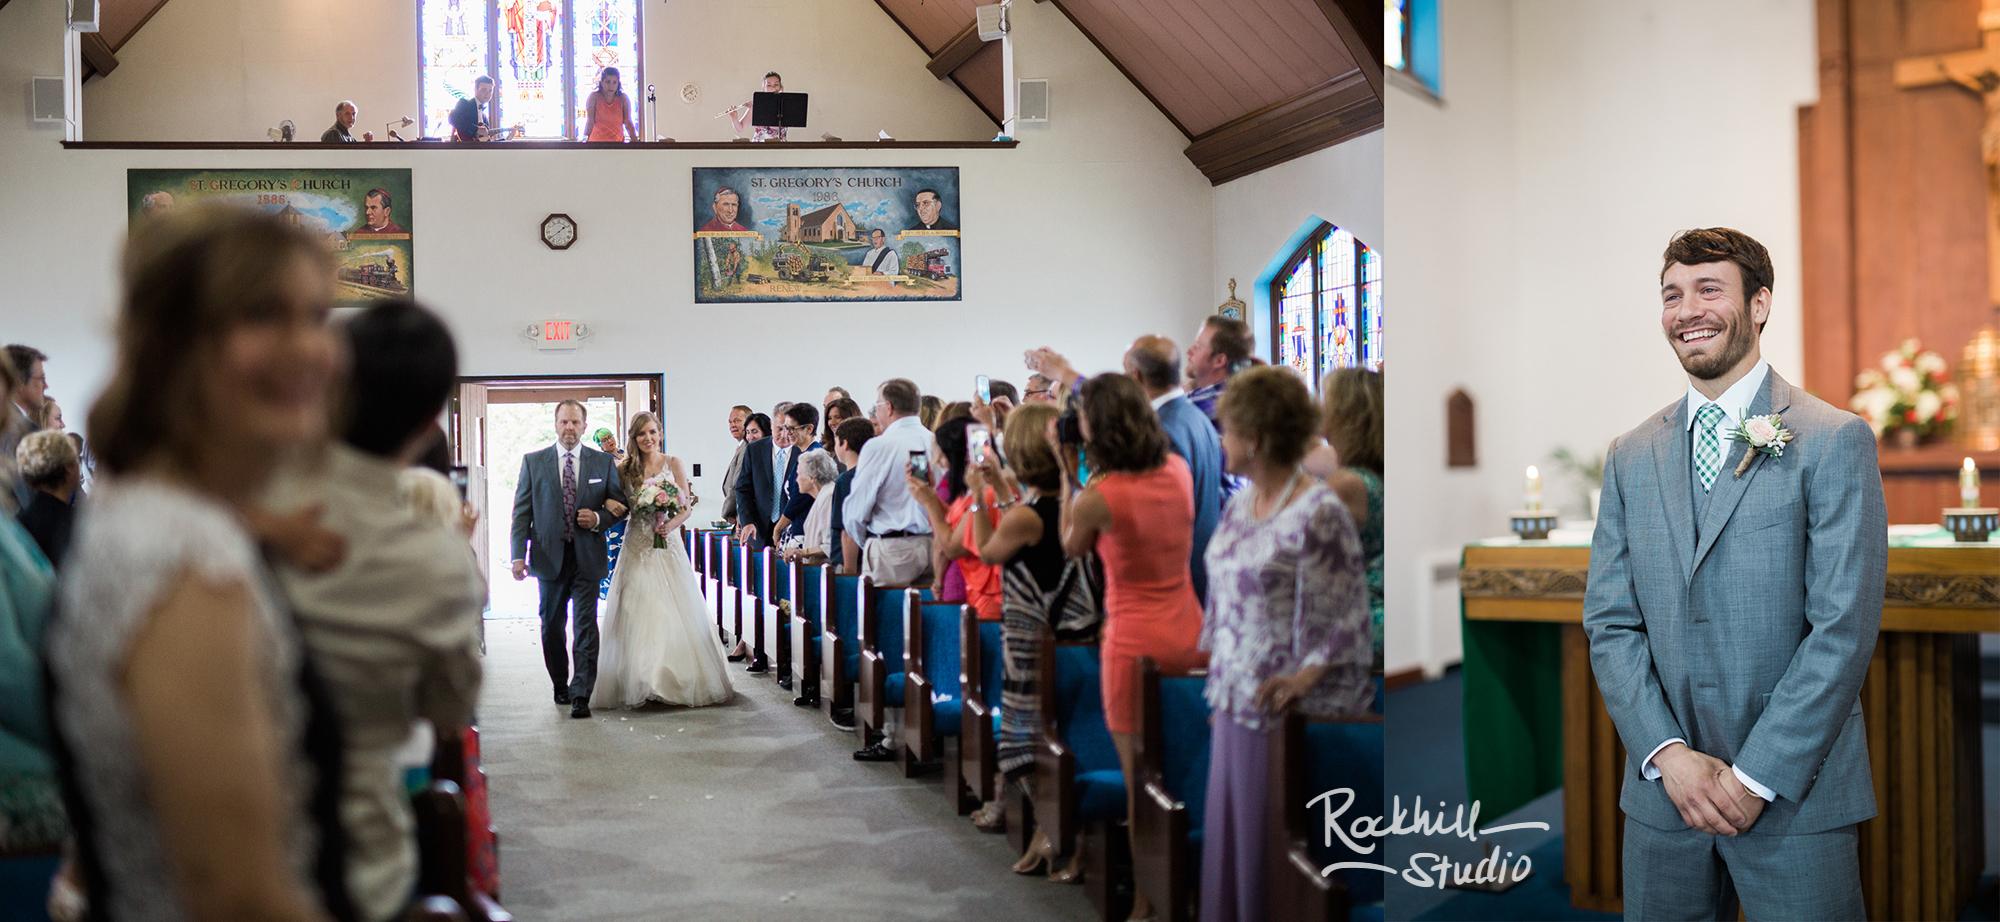 newberry-michigan-wedding-upper-peninsula-spring-photography-rockhill-ee-18.jpg